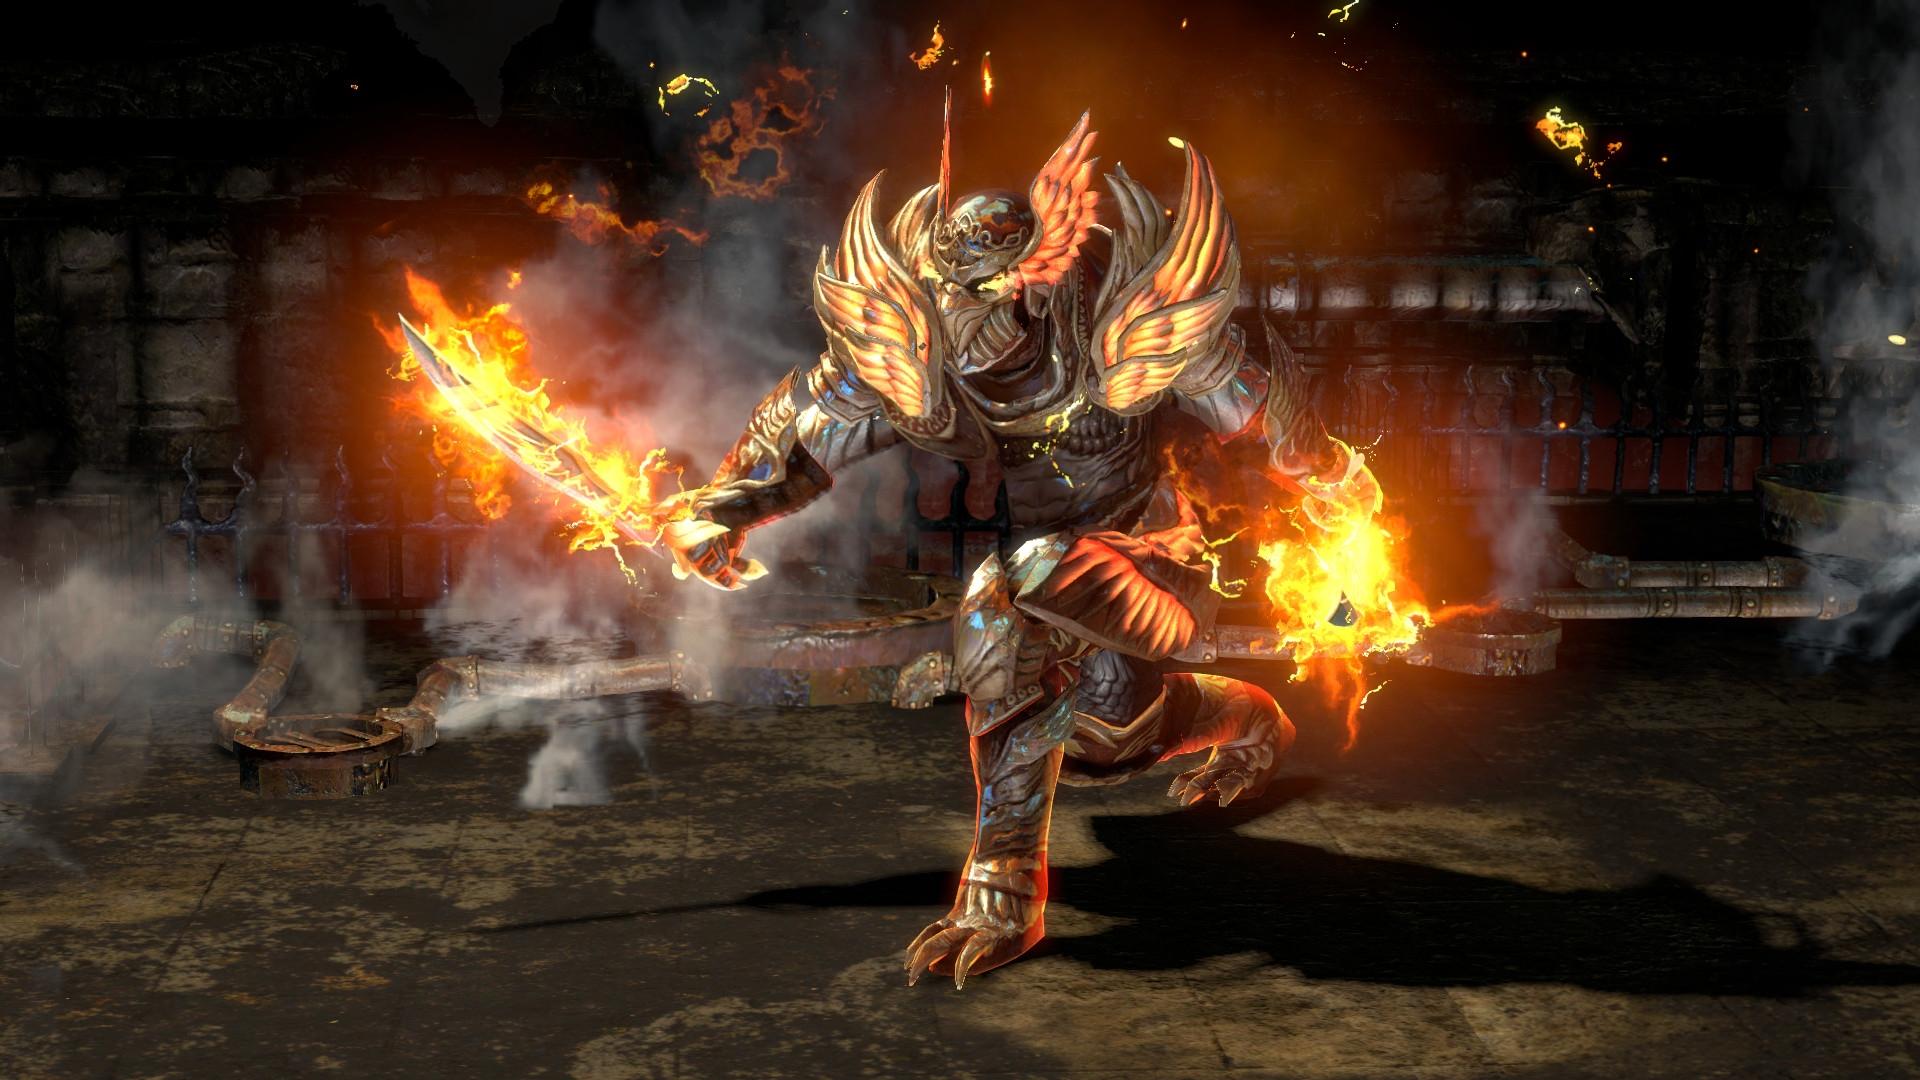 Релиз Path of Exile на PS4 перенесён на следующий год